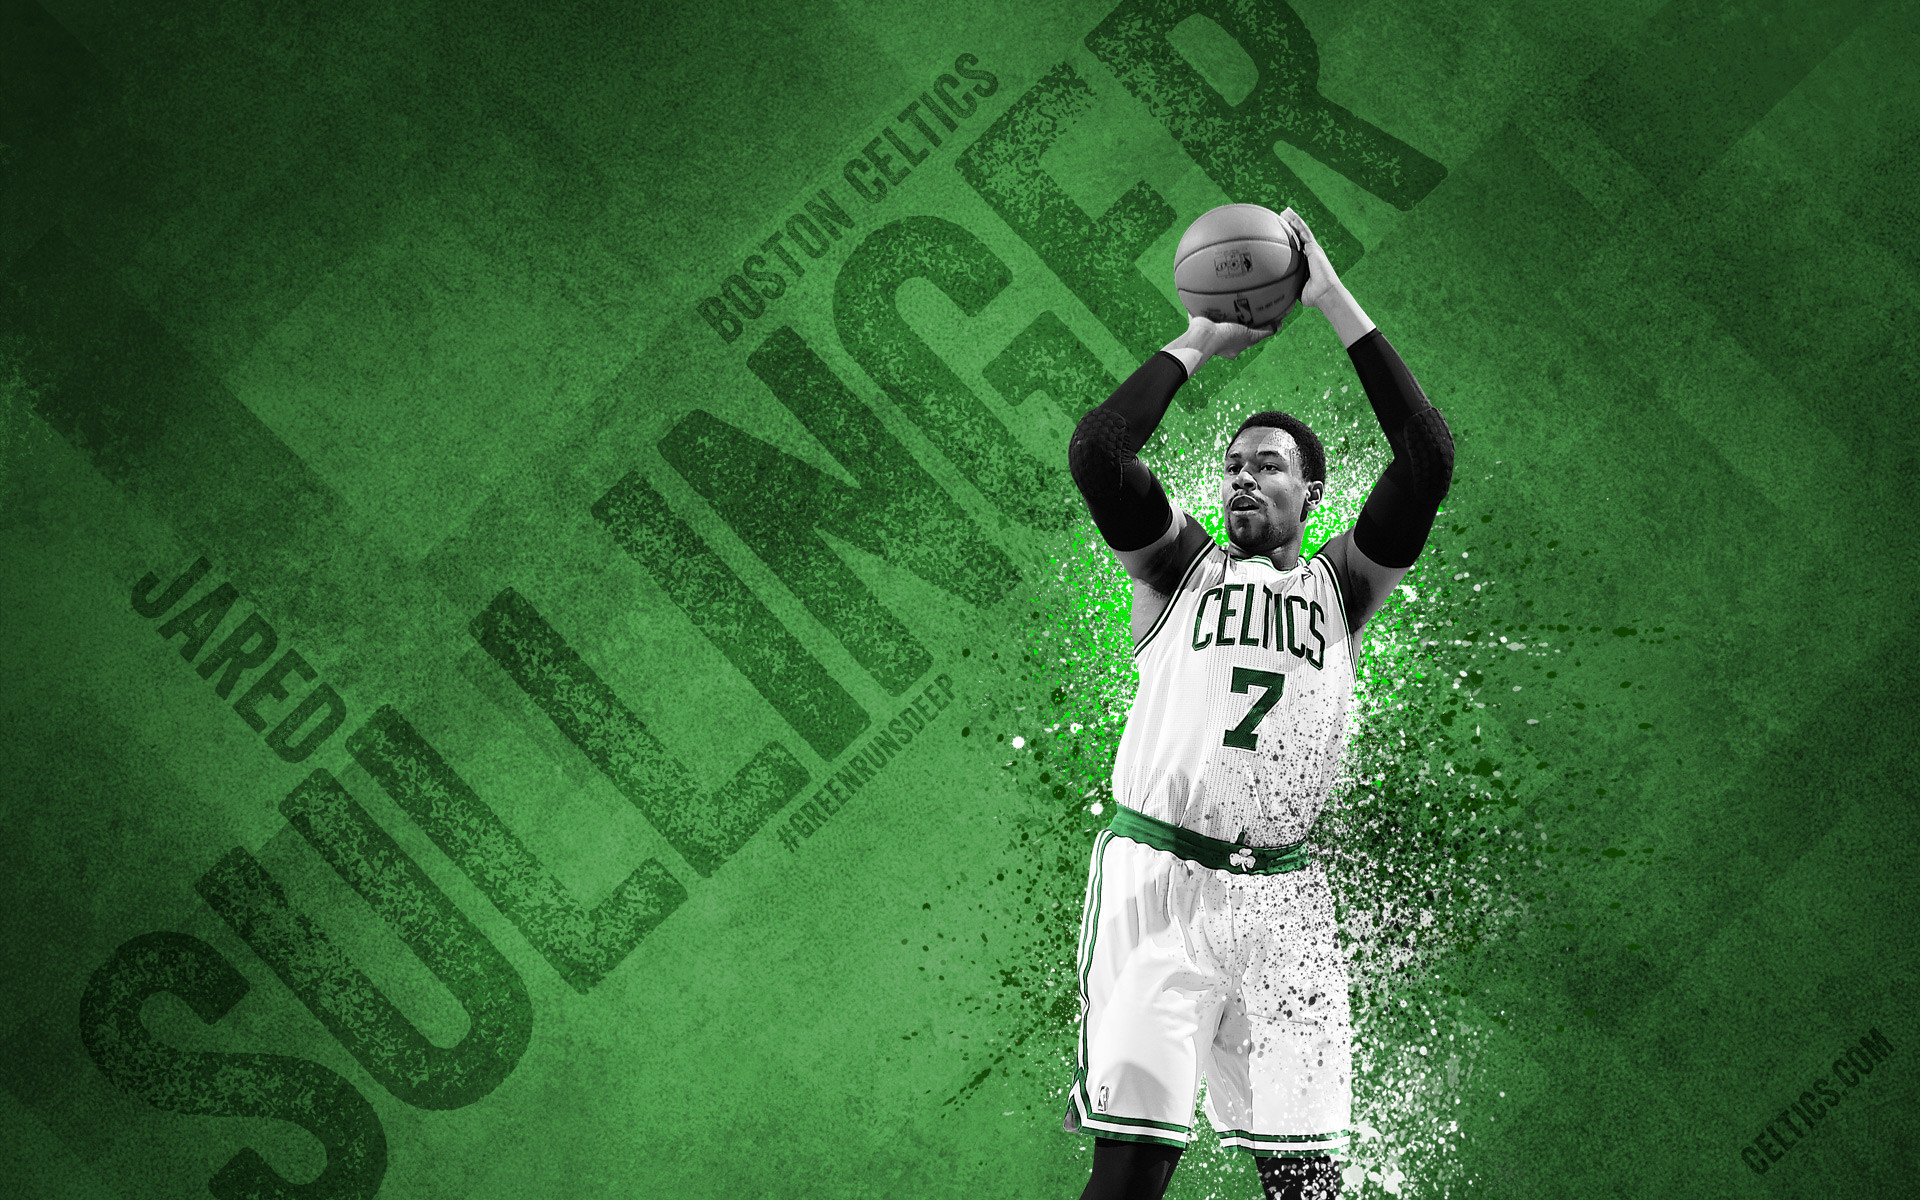 Boston Celtics Wallpaper 2019 , HD Wallpaper & Backgrounds